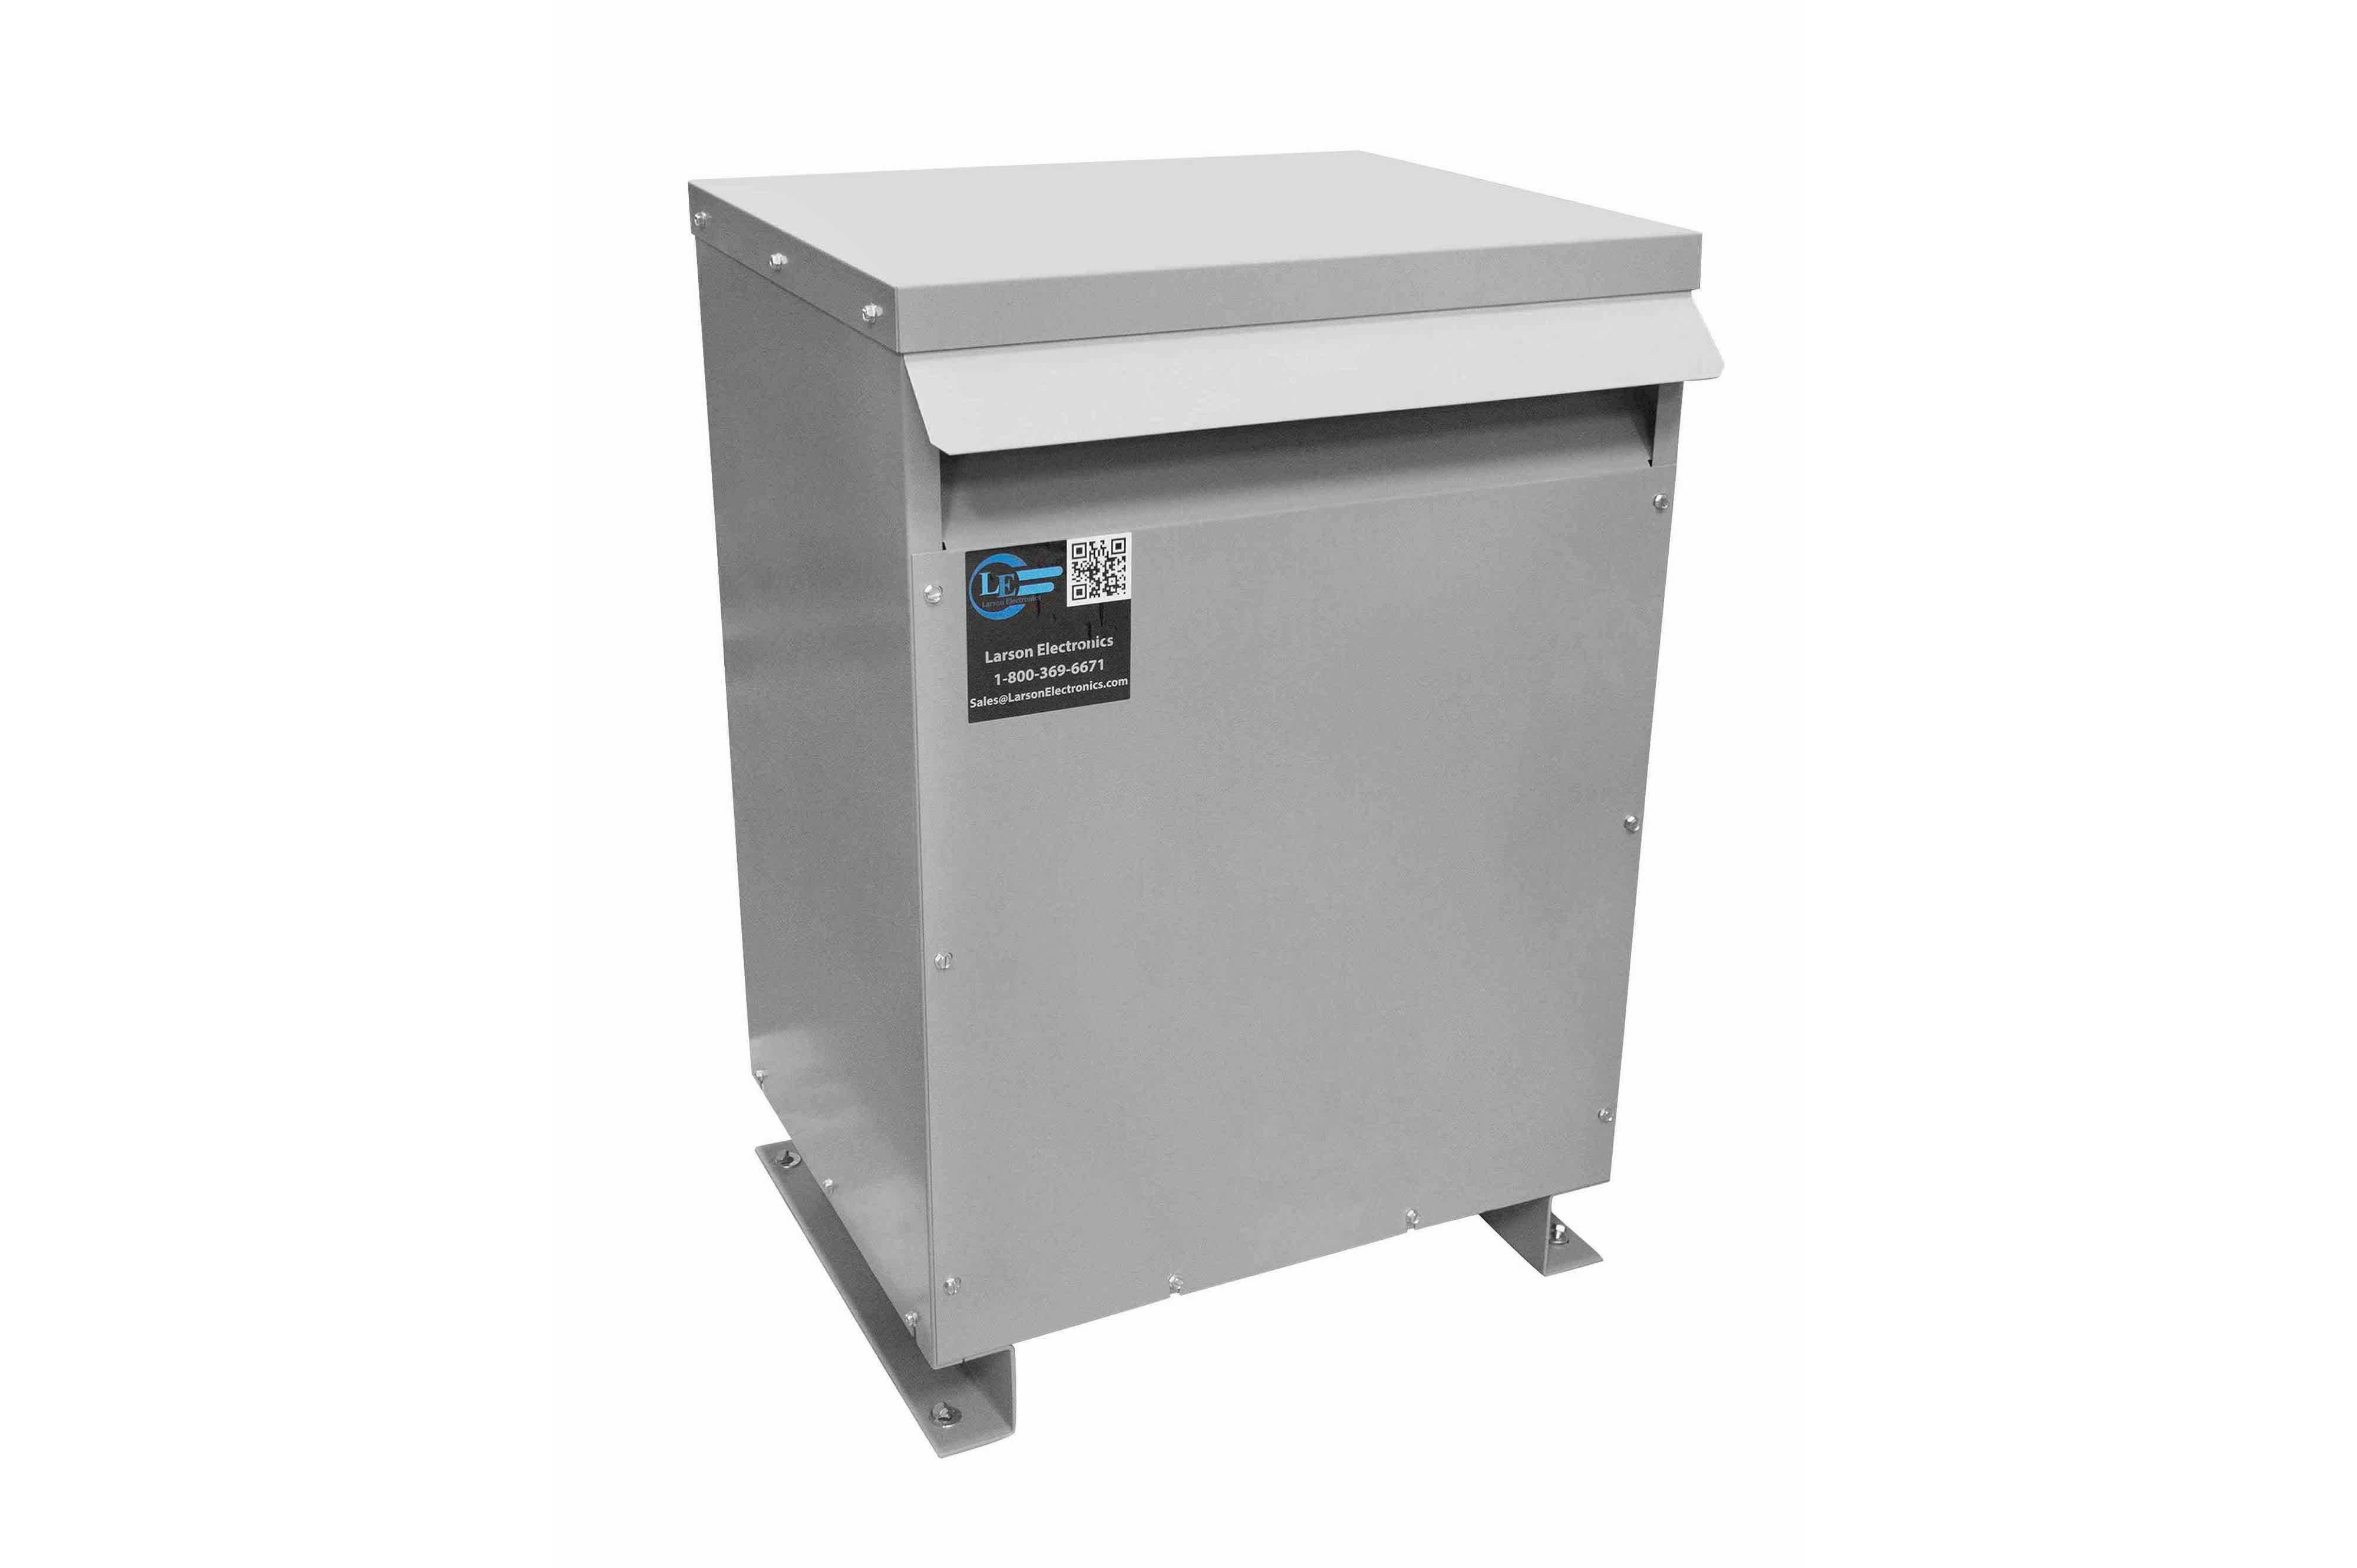 50 kVA 3PH DOE Transformer, 460V Delta Primary, 380Y/220 Wye-N Secondary, N3R, Ventilated, 60 Hz